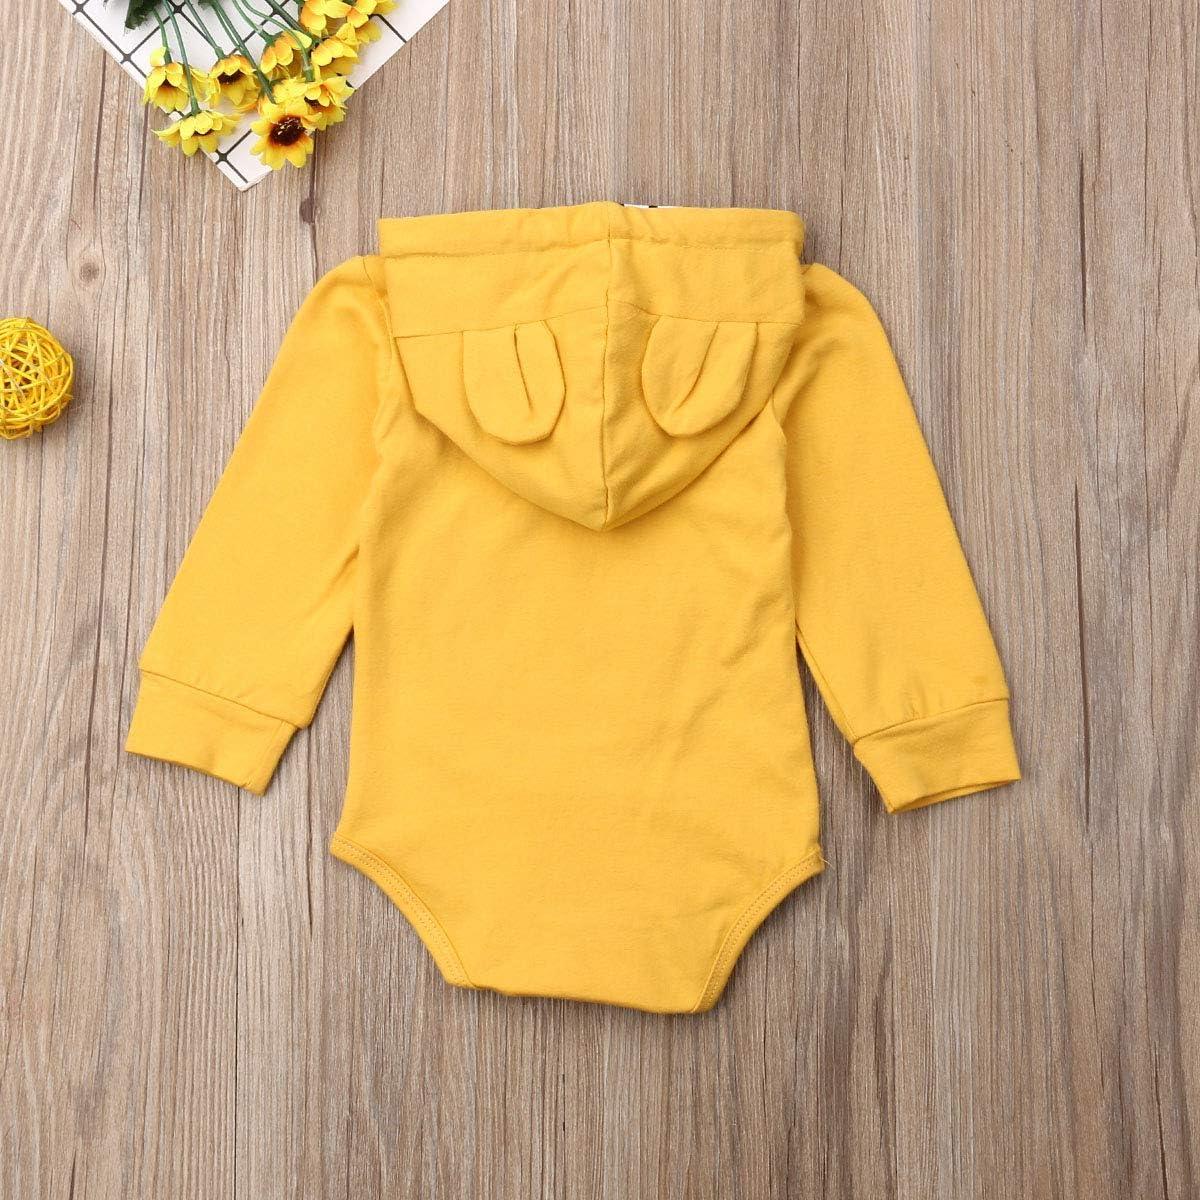 Bmnmsl Baby Boy Hoodie Romper Long Sleeve Newborn Infant Cotton Jumpsuit Bodysuit 0-12 Months Clothes